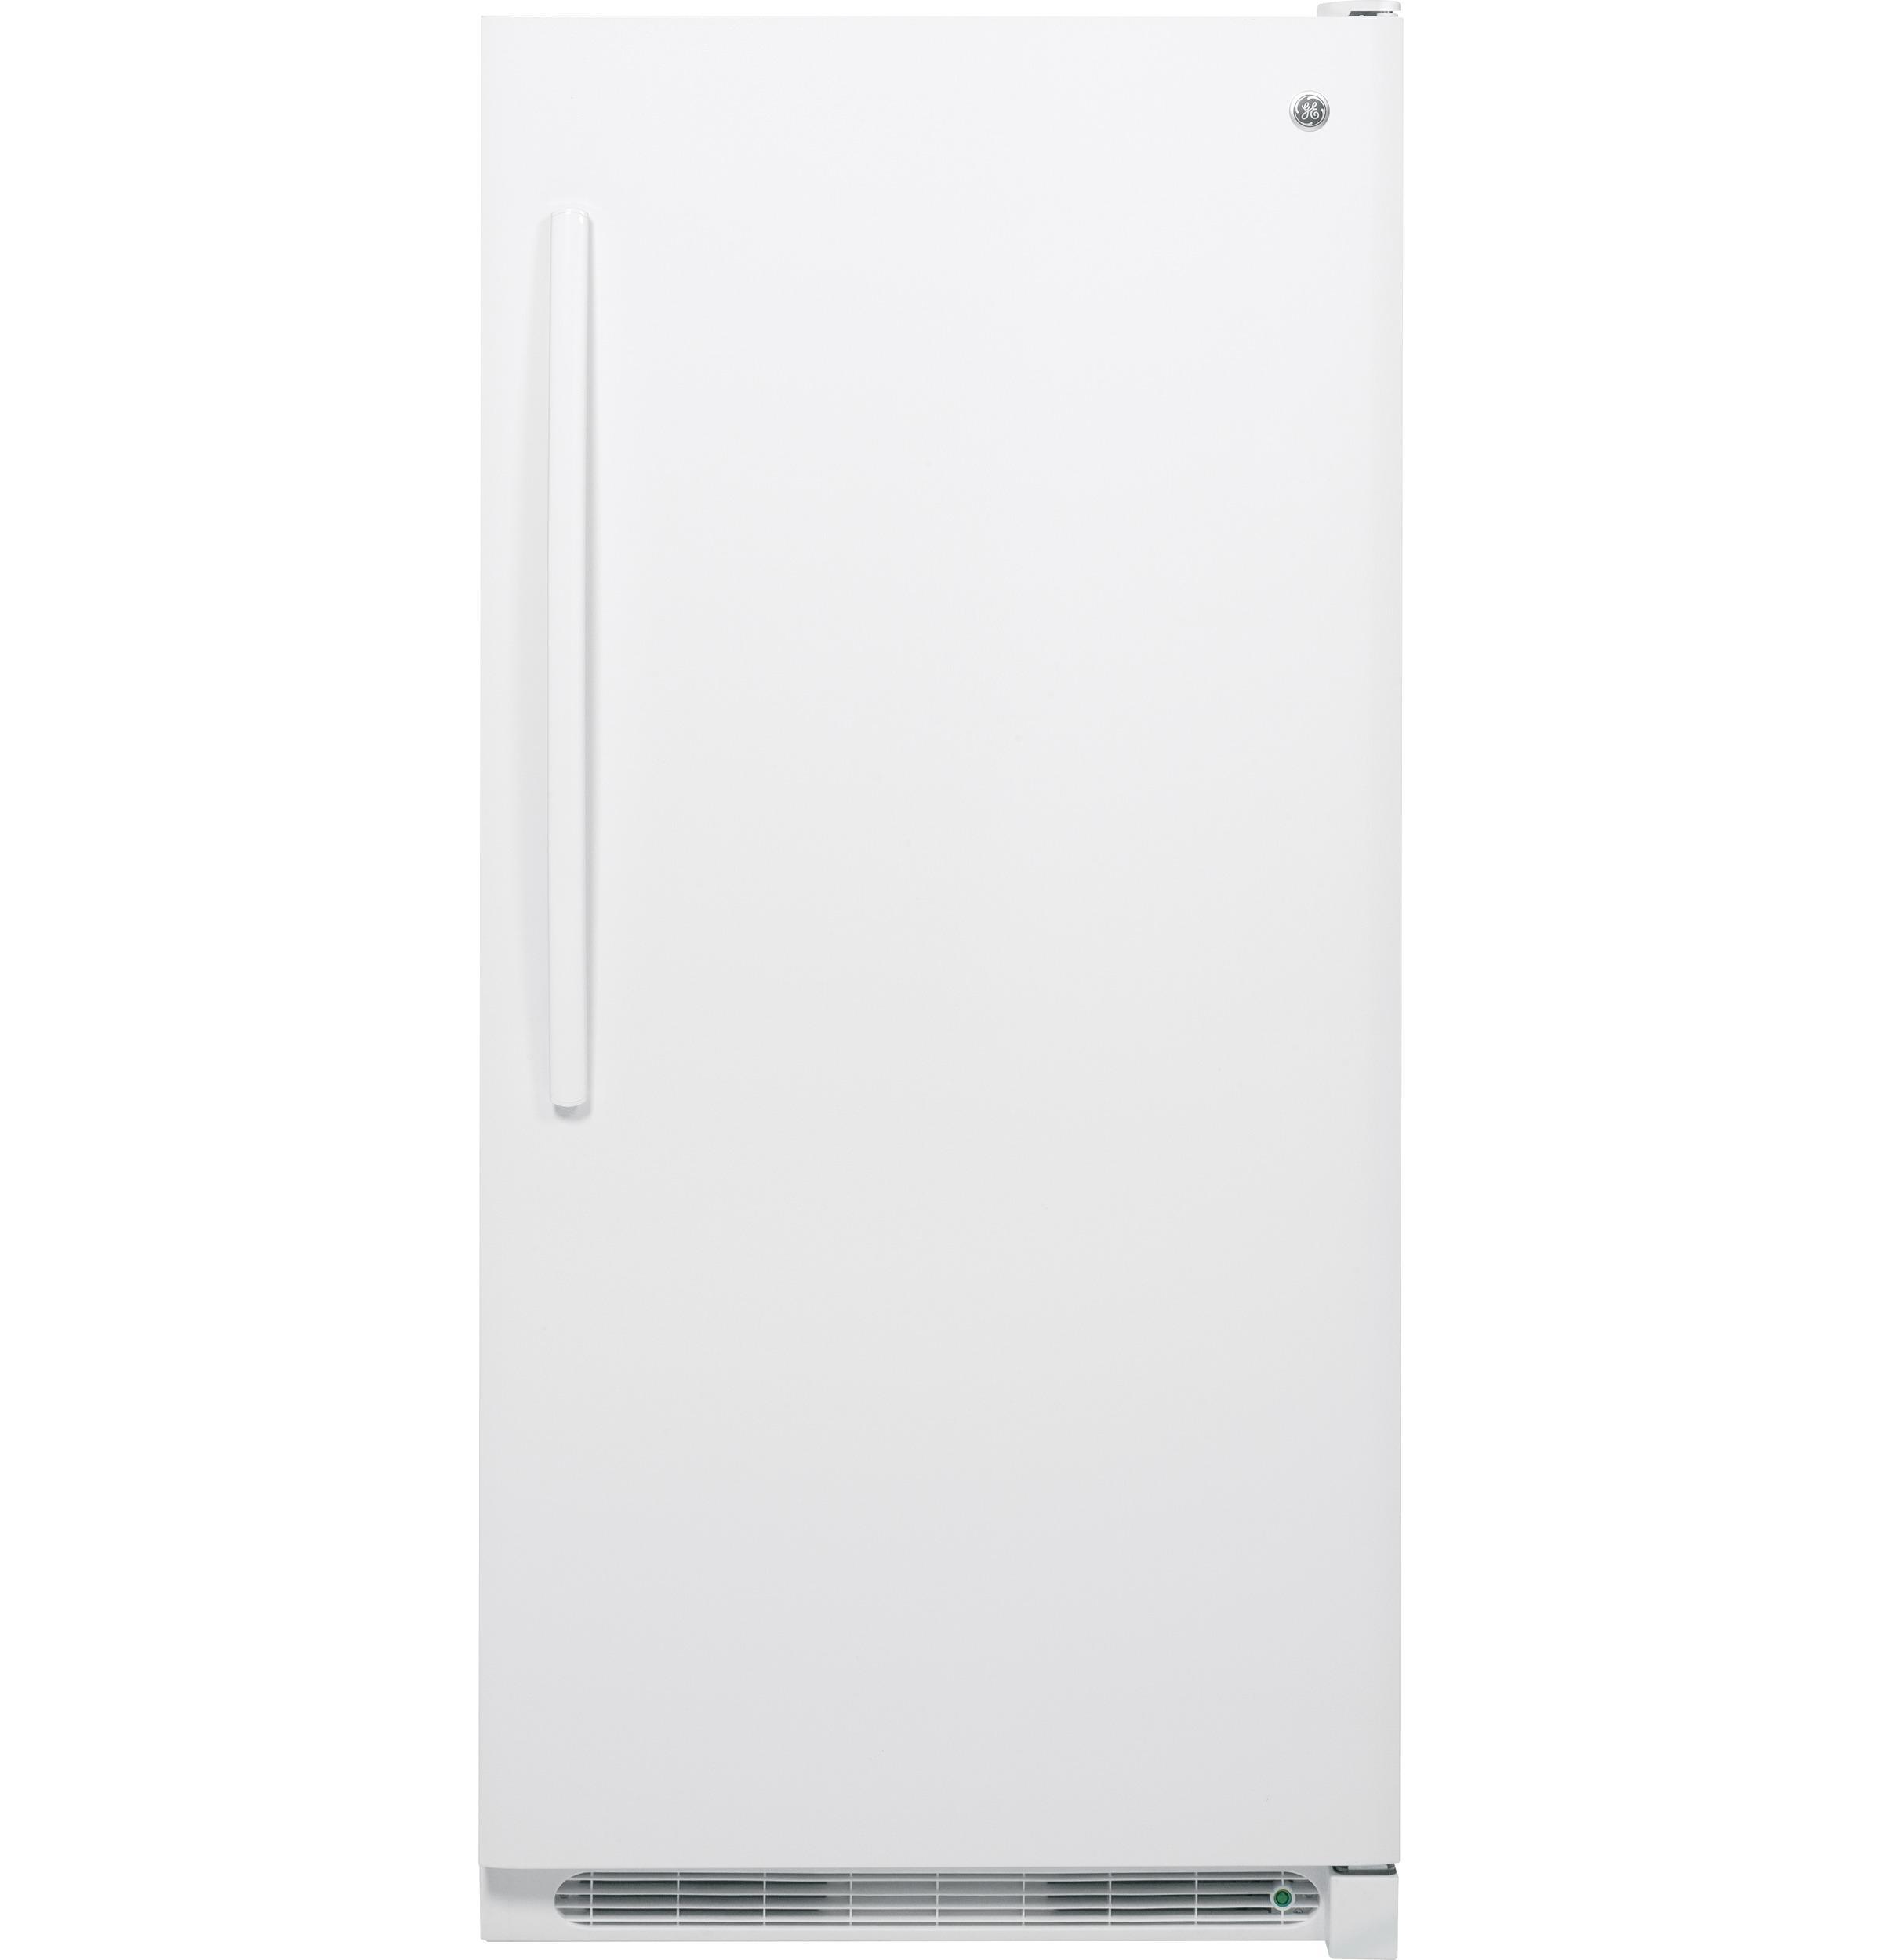 fum21dhrww in white by ge appliances in oliver springs tn ge rh harveysfurnitureco com ge profile refrigerator manual defrost GE Fridge Model 211 TBX